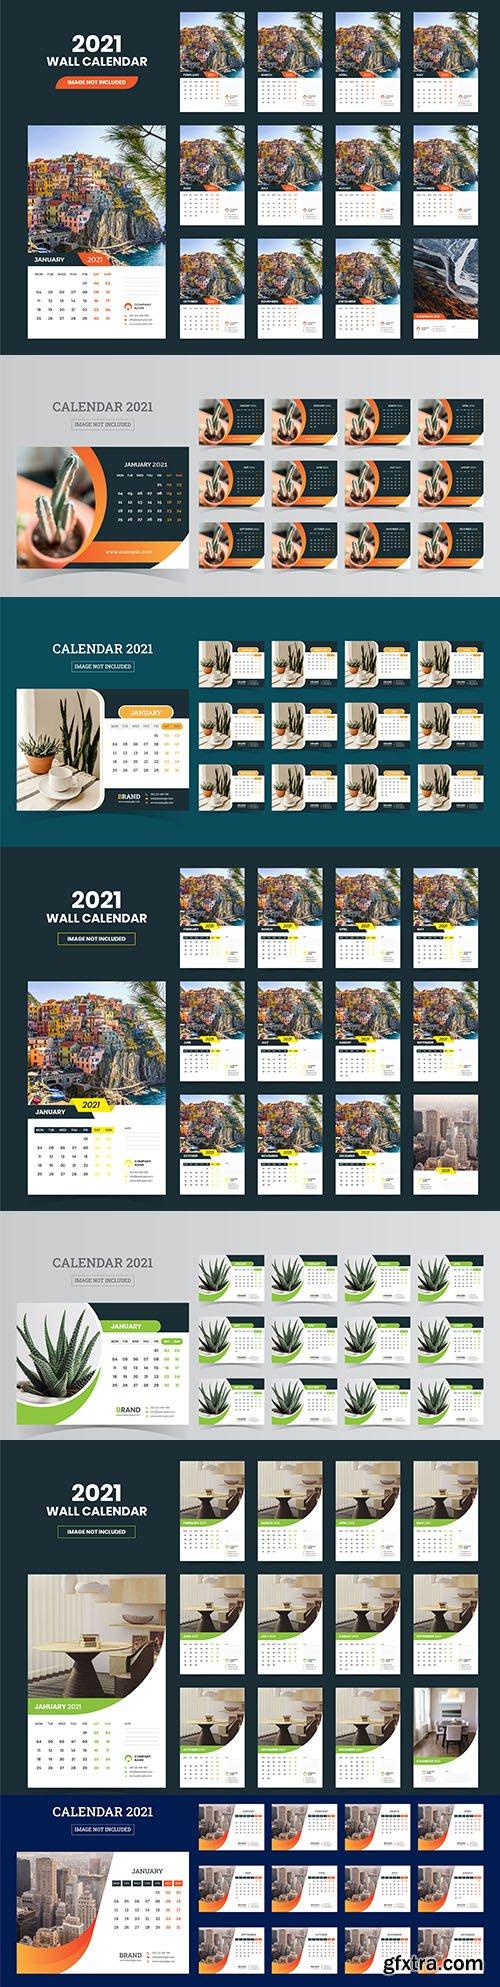 Desktop calendar for 2021 with decorative photos